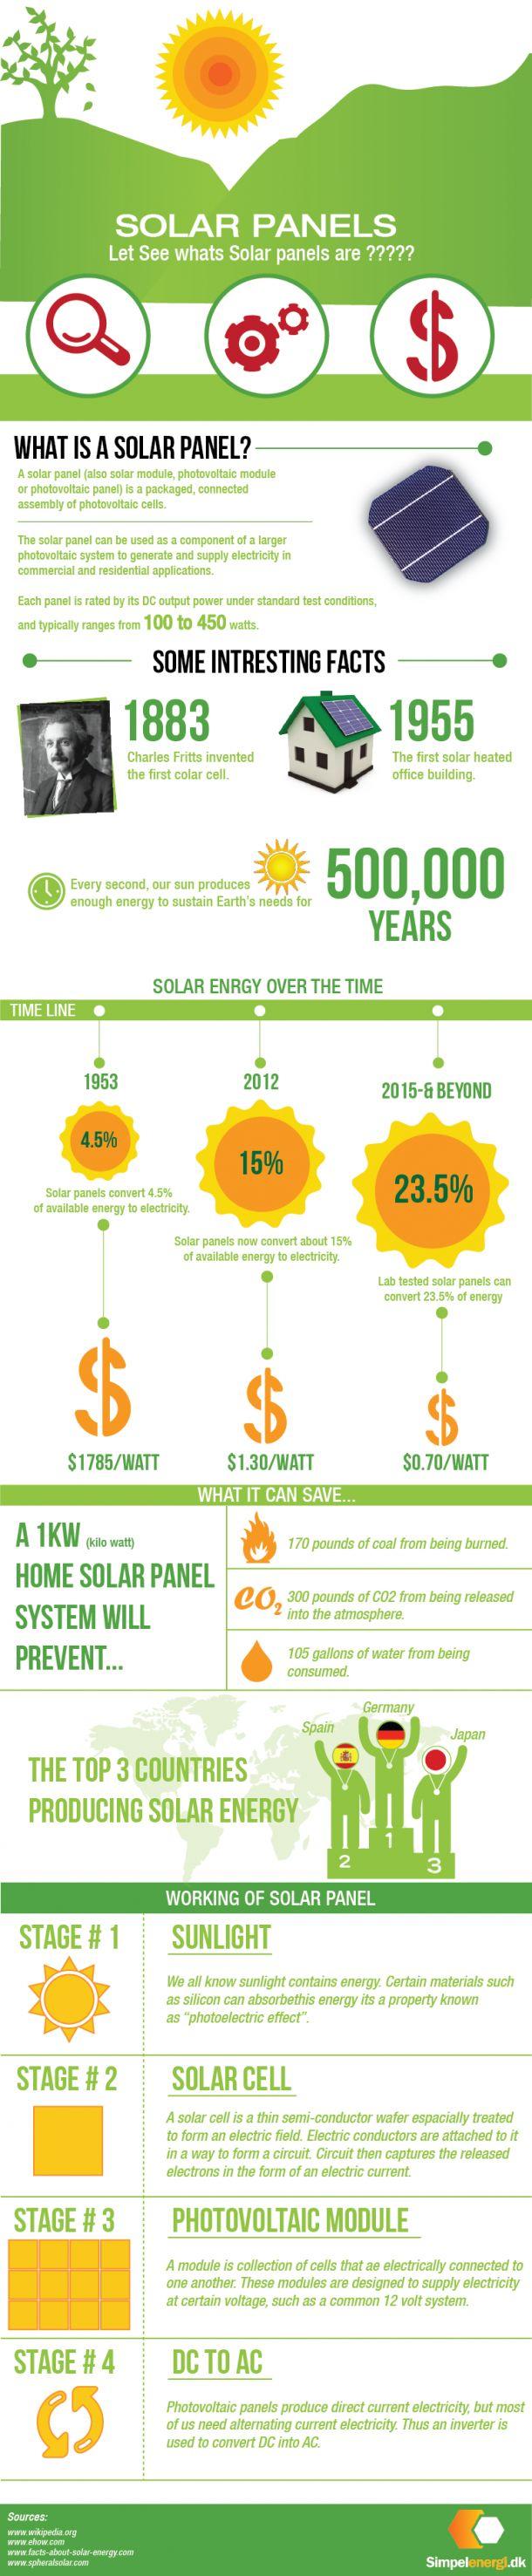 http://theenergysolar.com  Solar Panel explained.